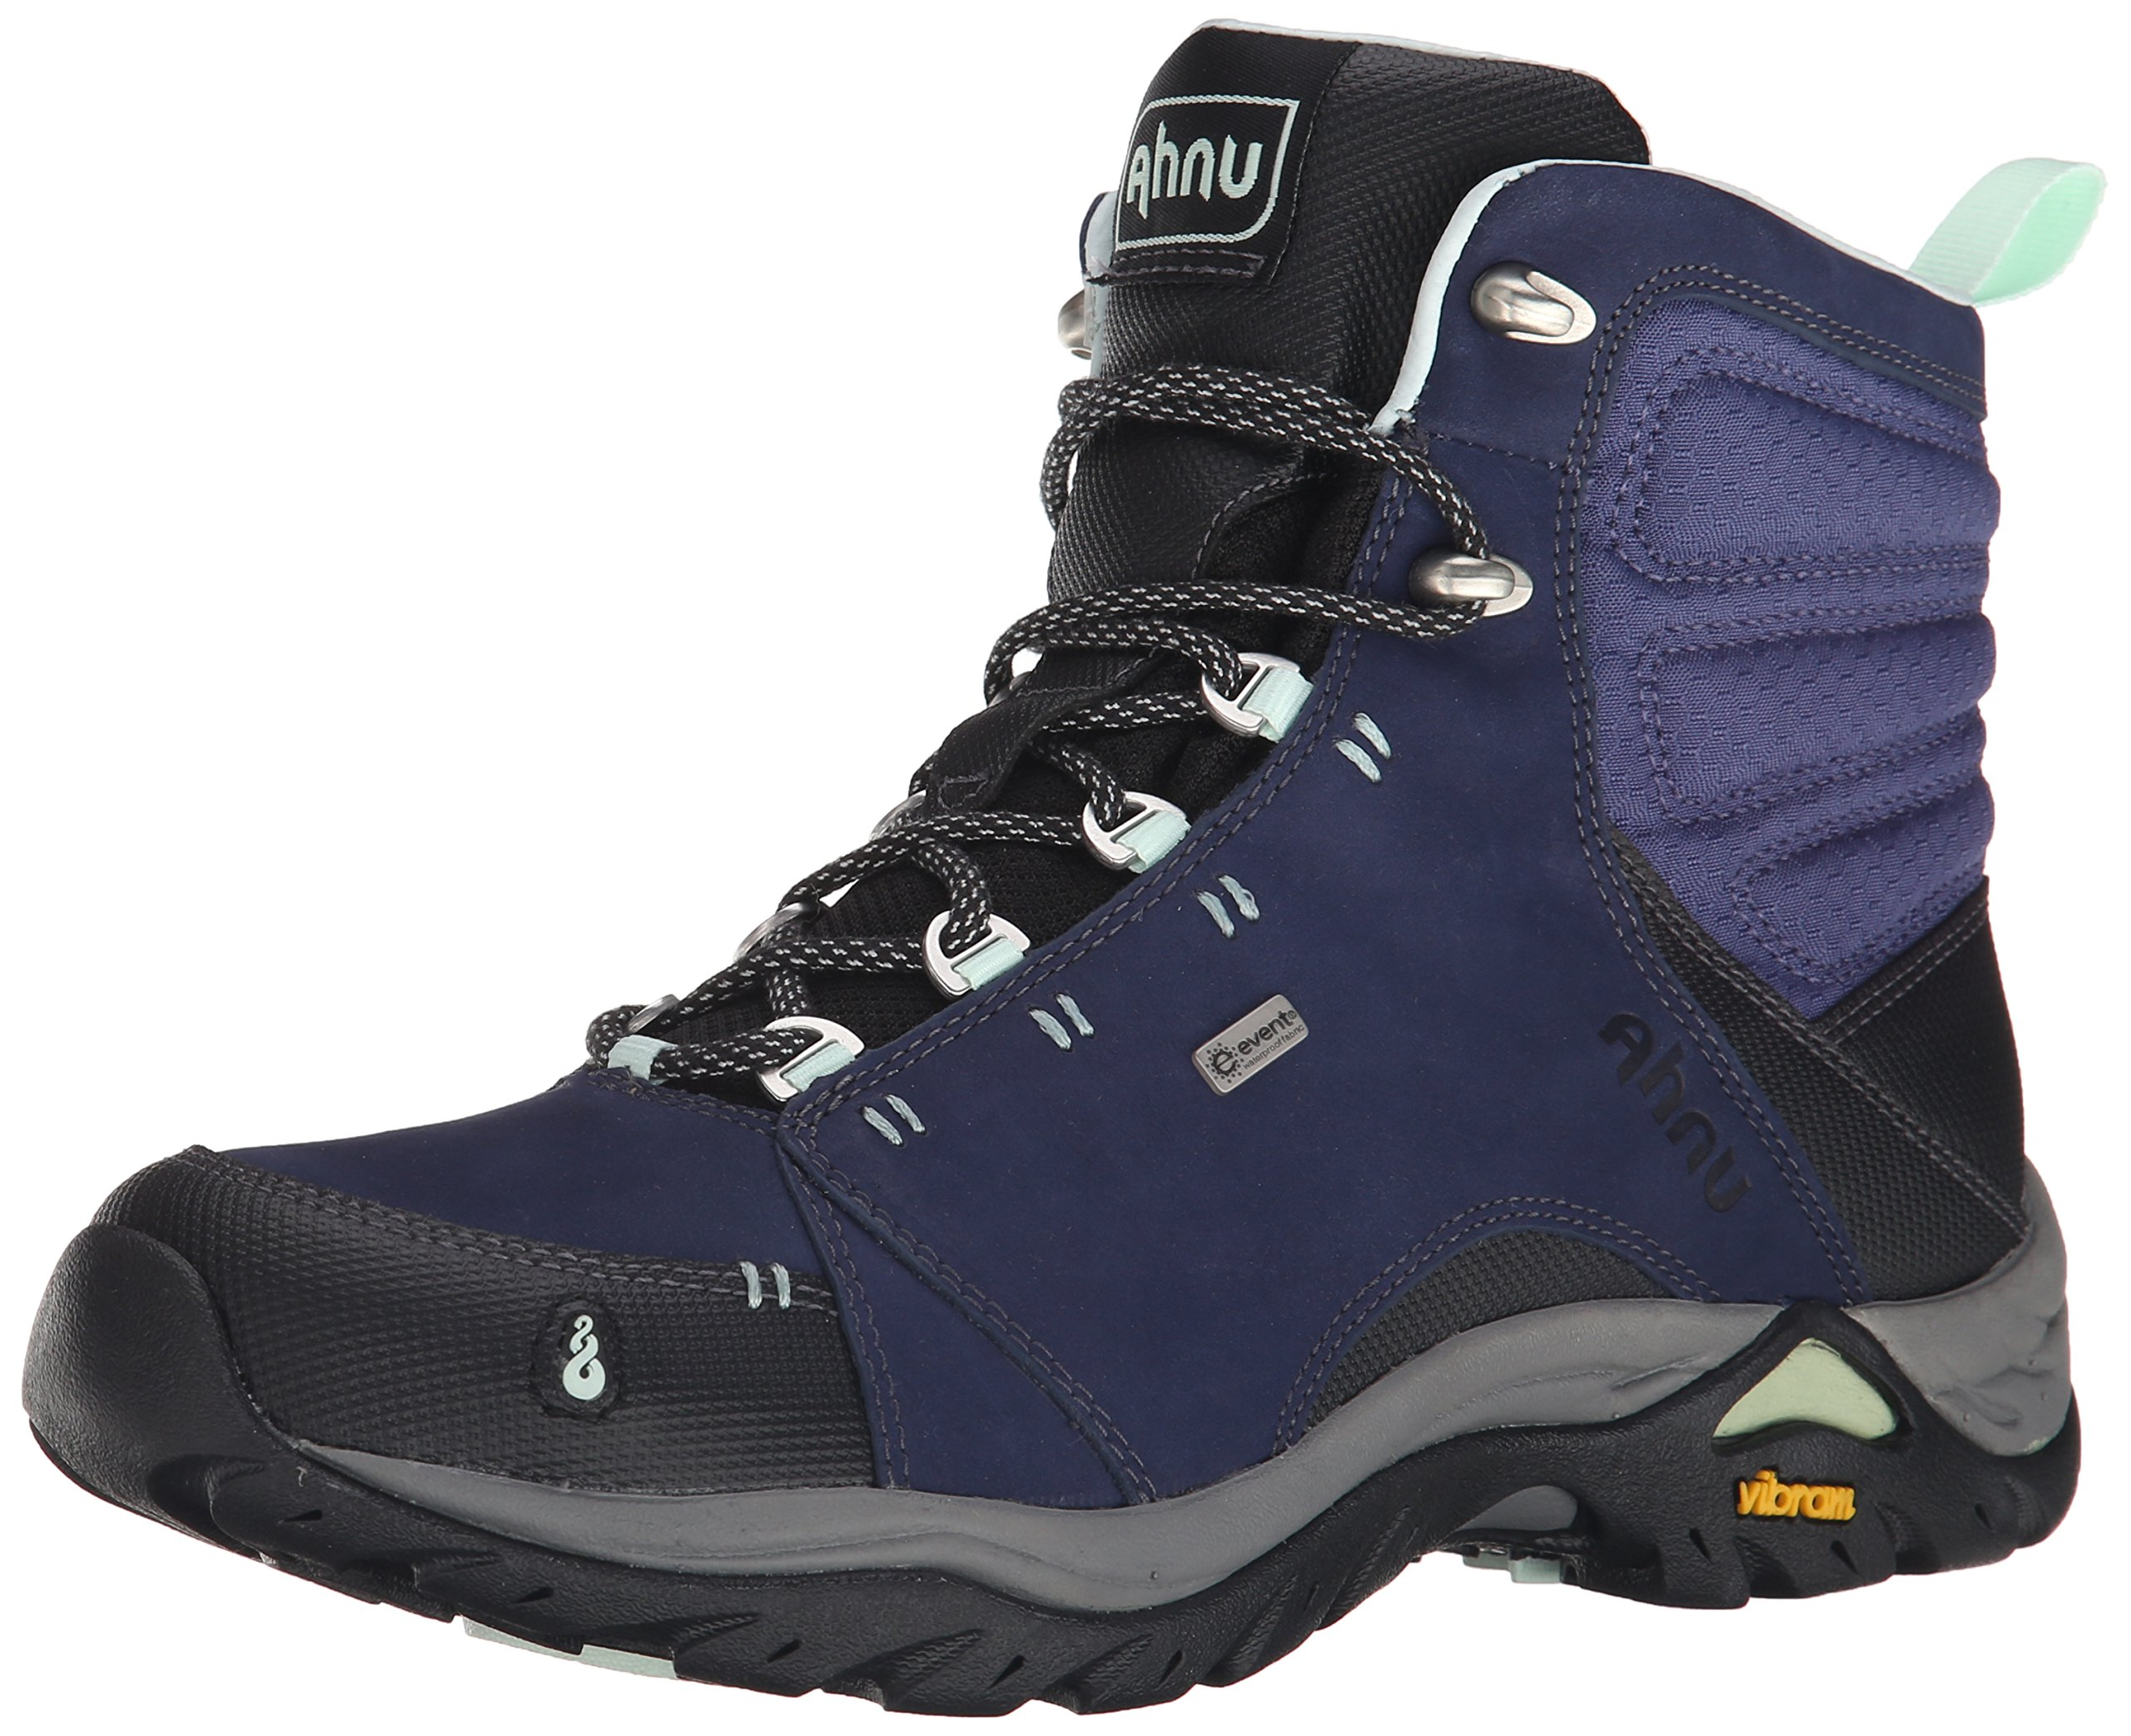 Ahnu Women's Montara Waterproof Boot,Midnight Blue,9 M US